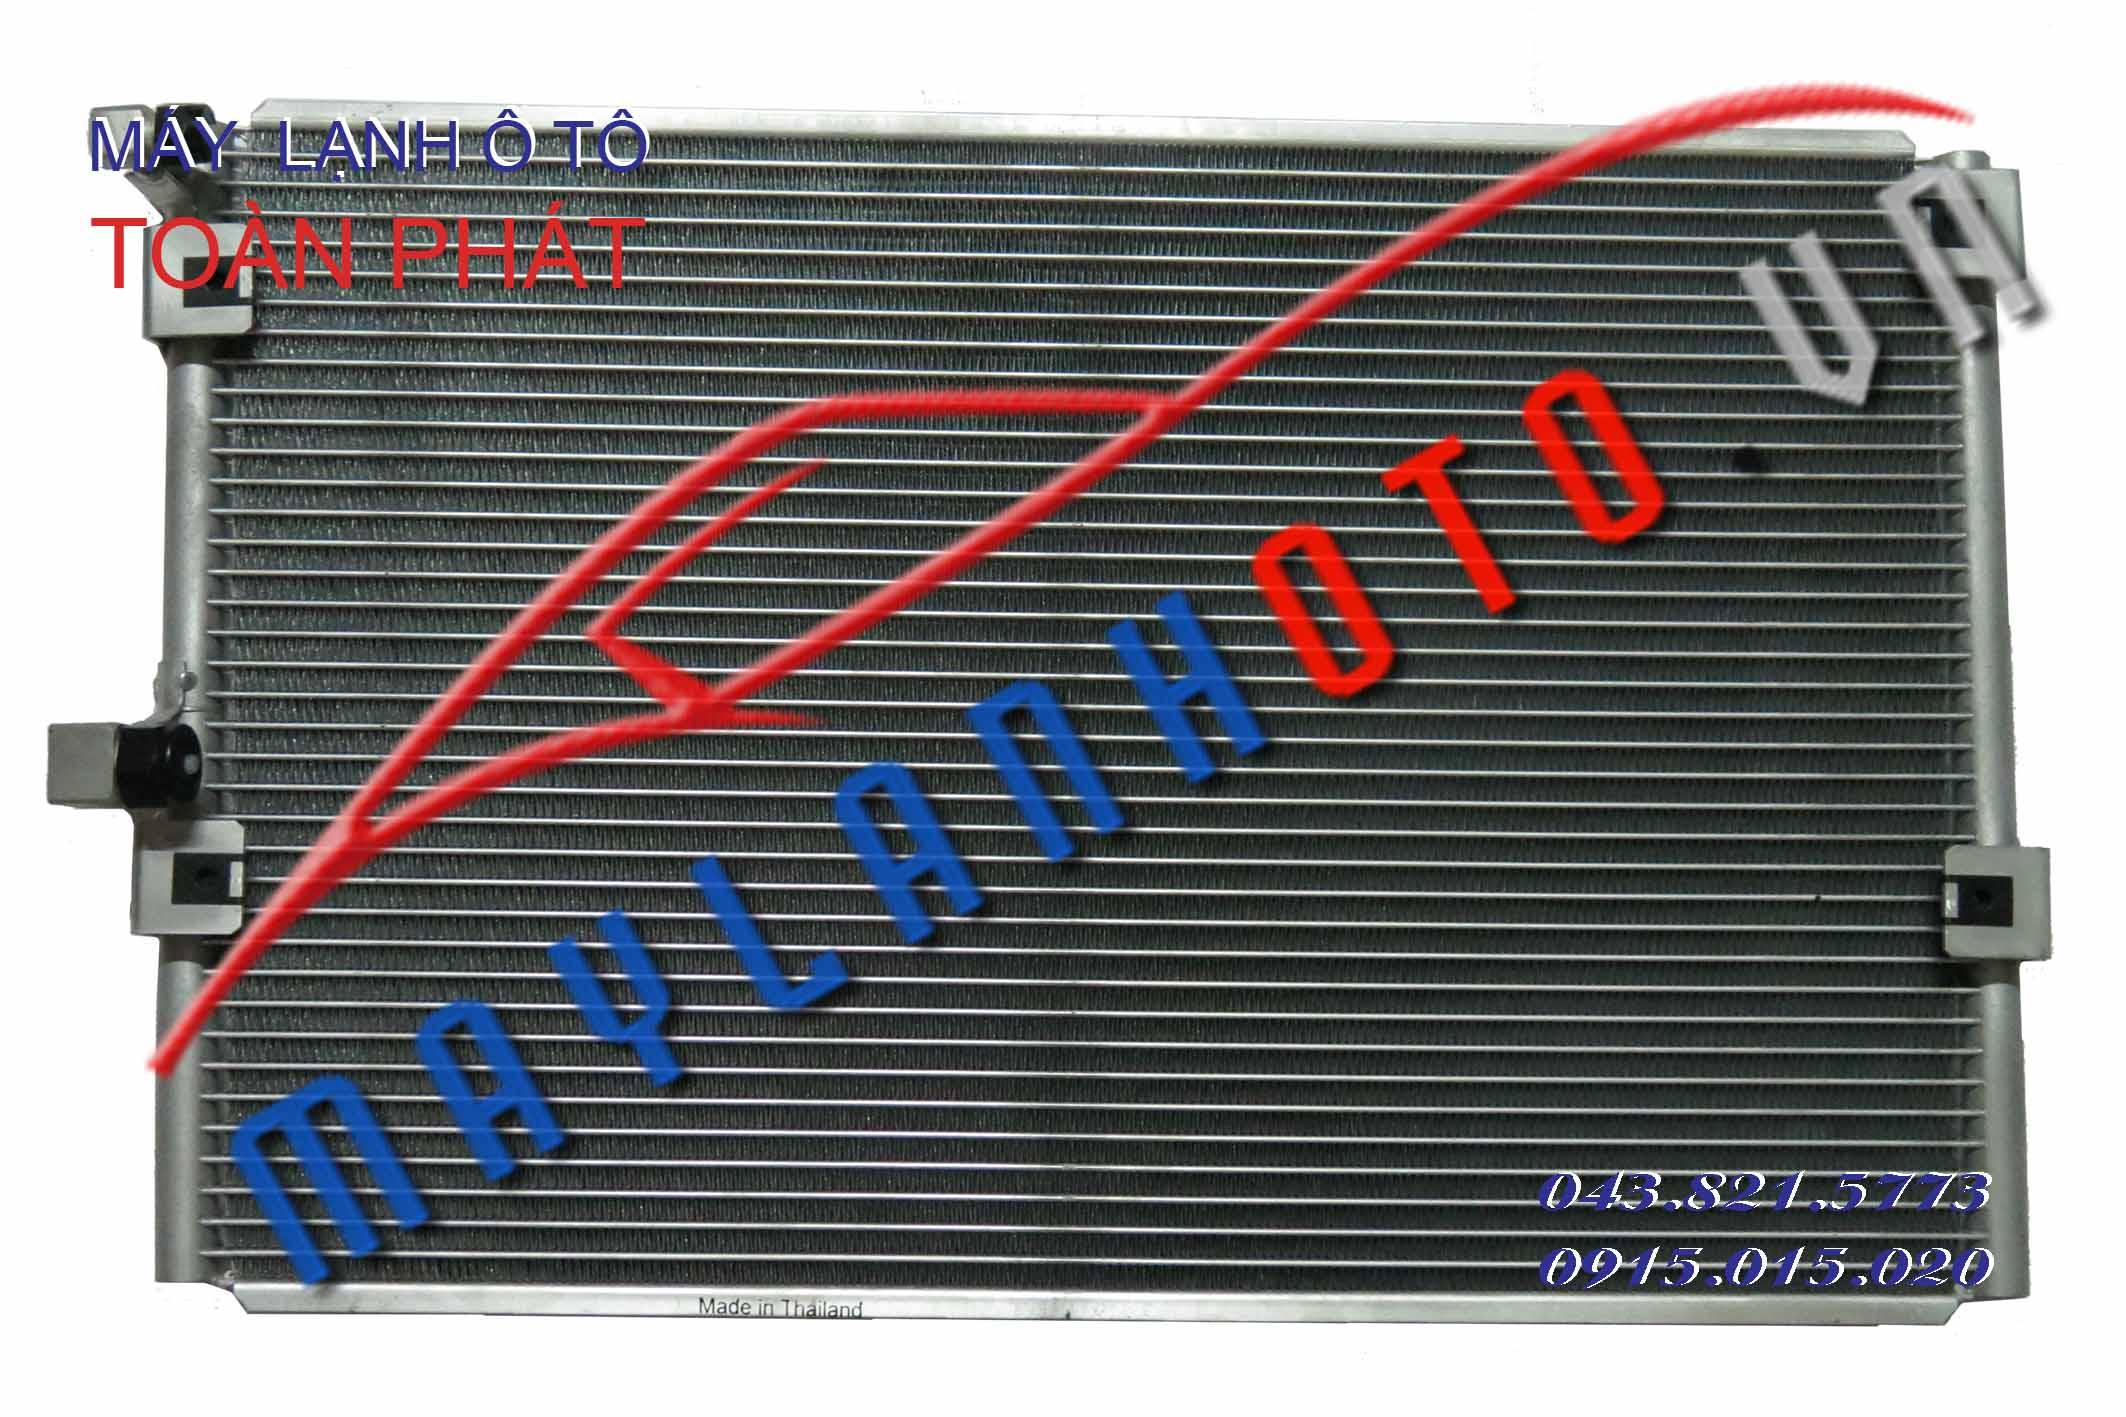 Zace 1.8 / Giàn nóng điều hòa Toyota Zace 1.8